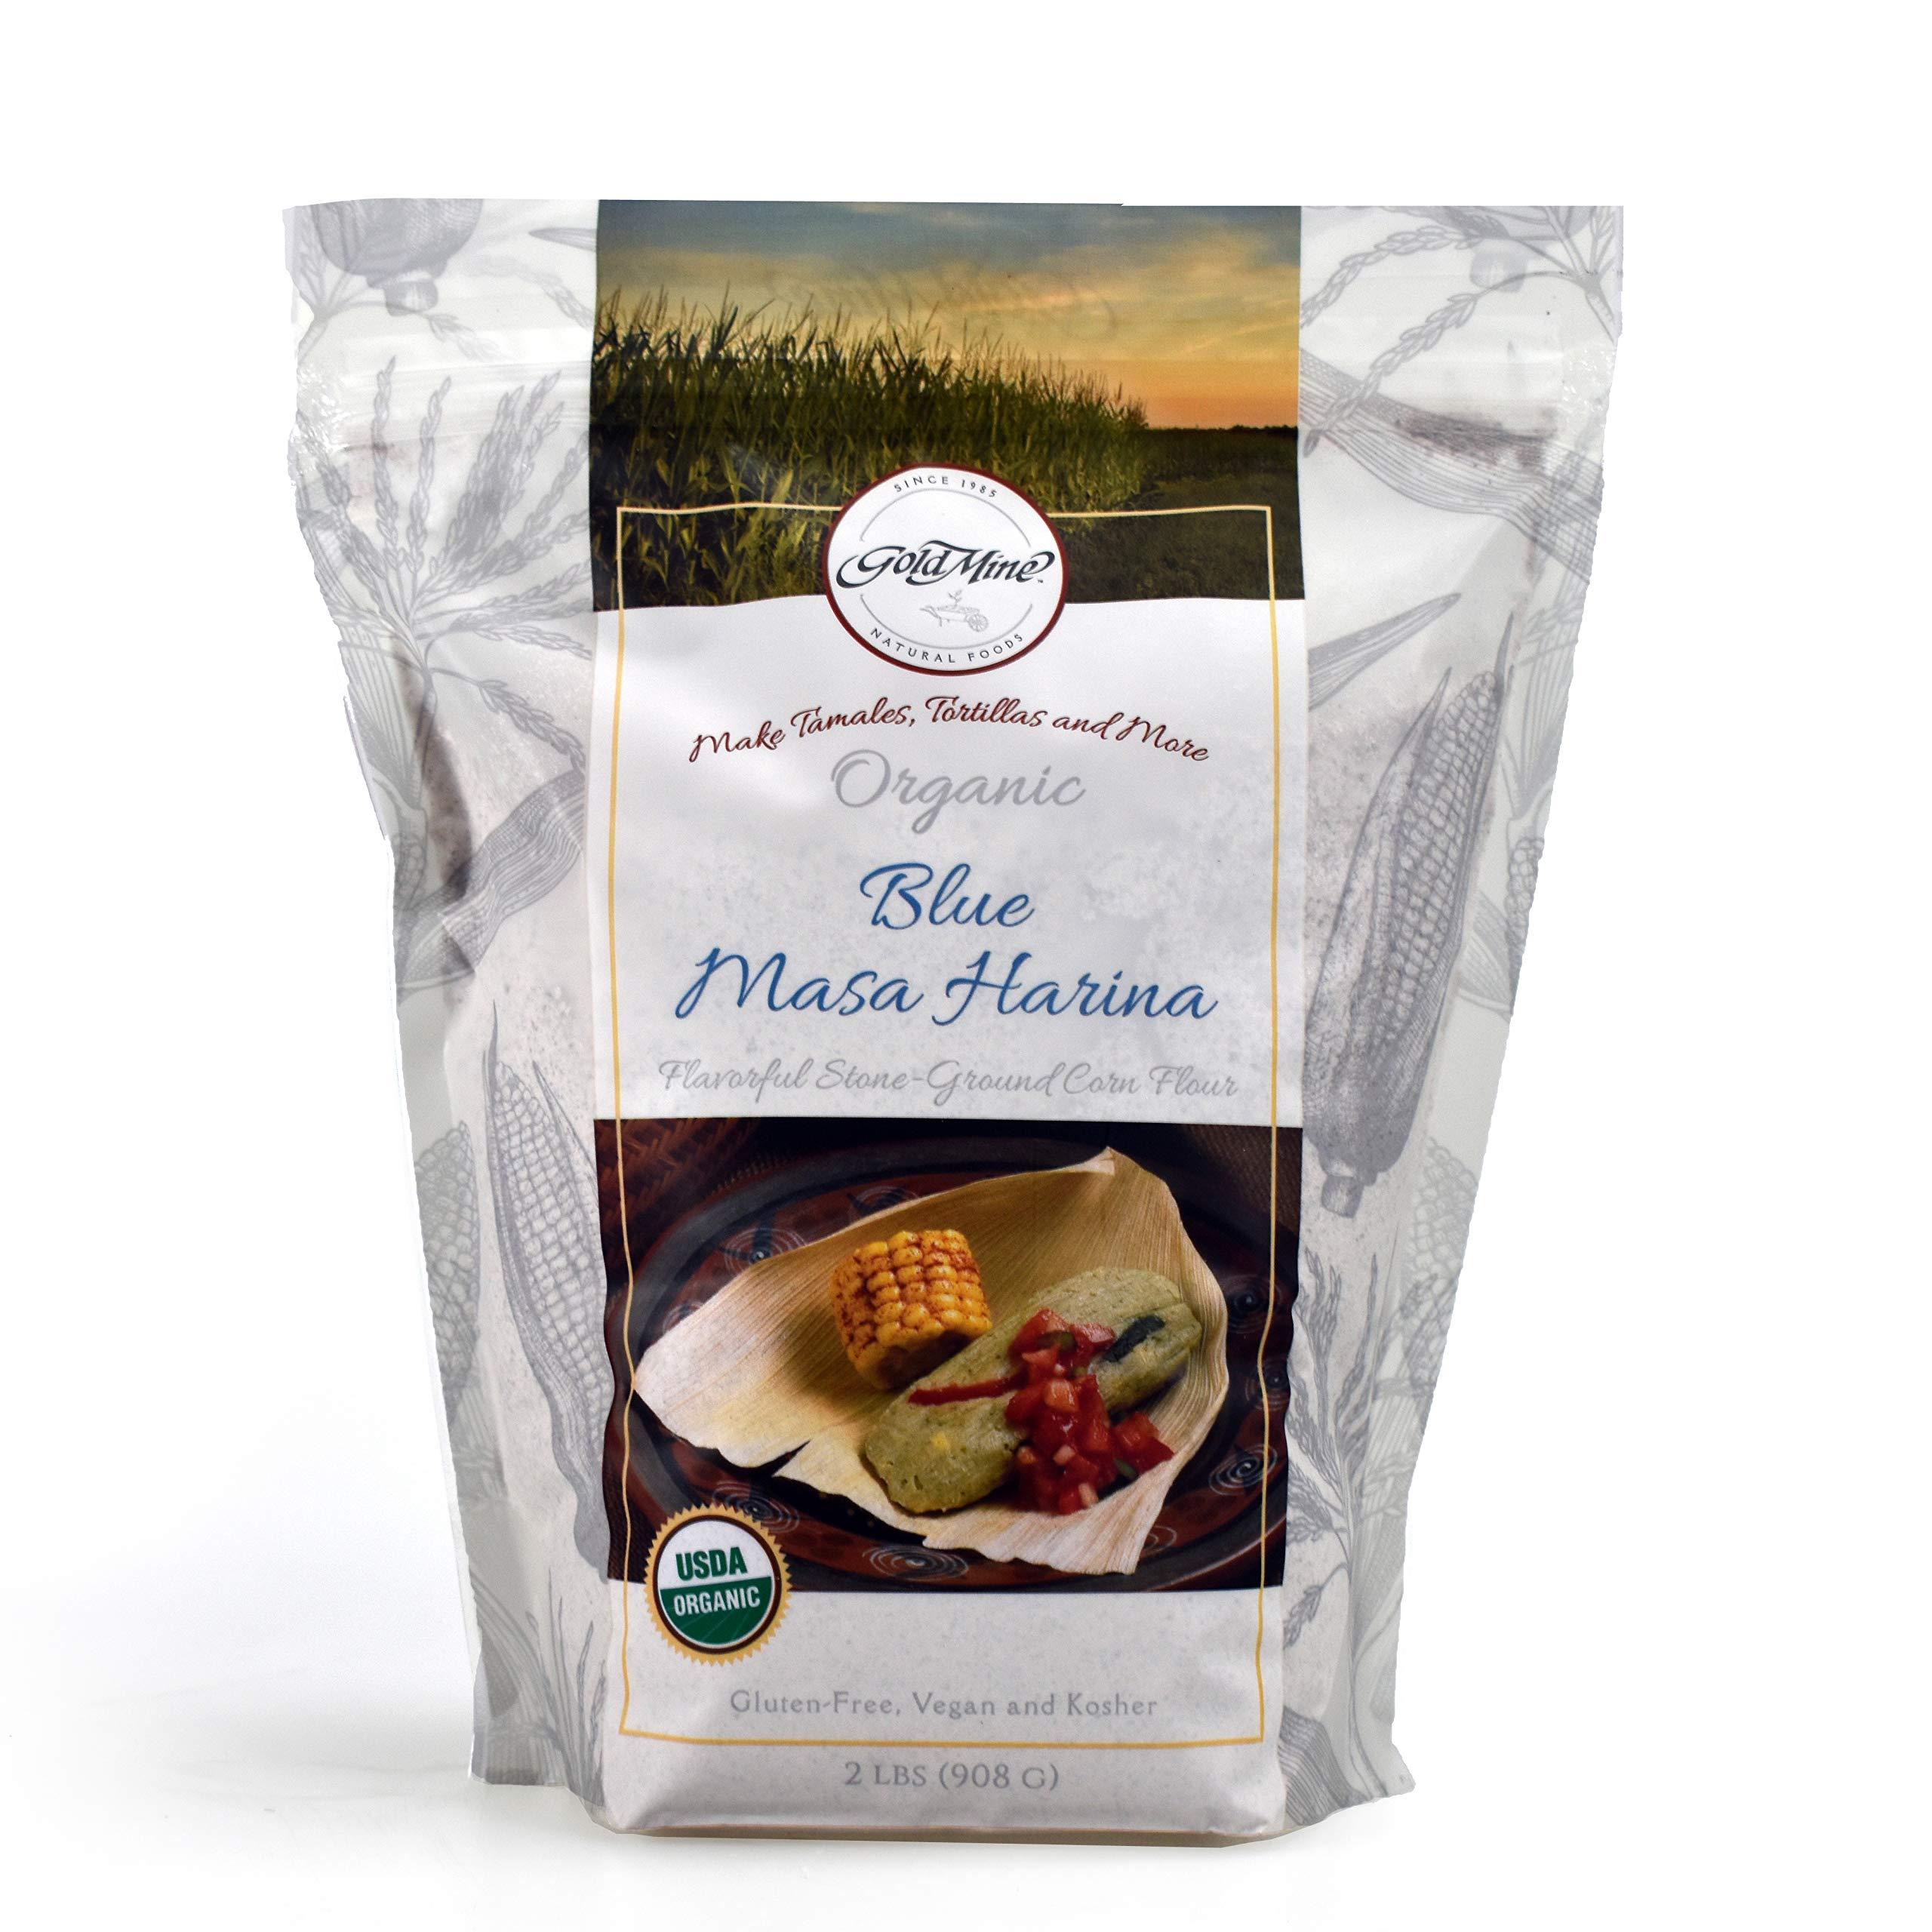 Gold Mine Blue Corn Masa Harina - USDA Organic - Macrobiotic, Vegan, Kosher and Gluten Free Flour for Healthy Mexican Dishes – 2 LBS